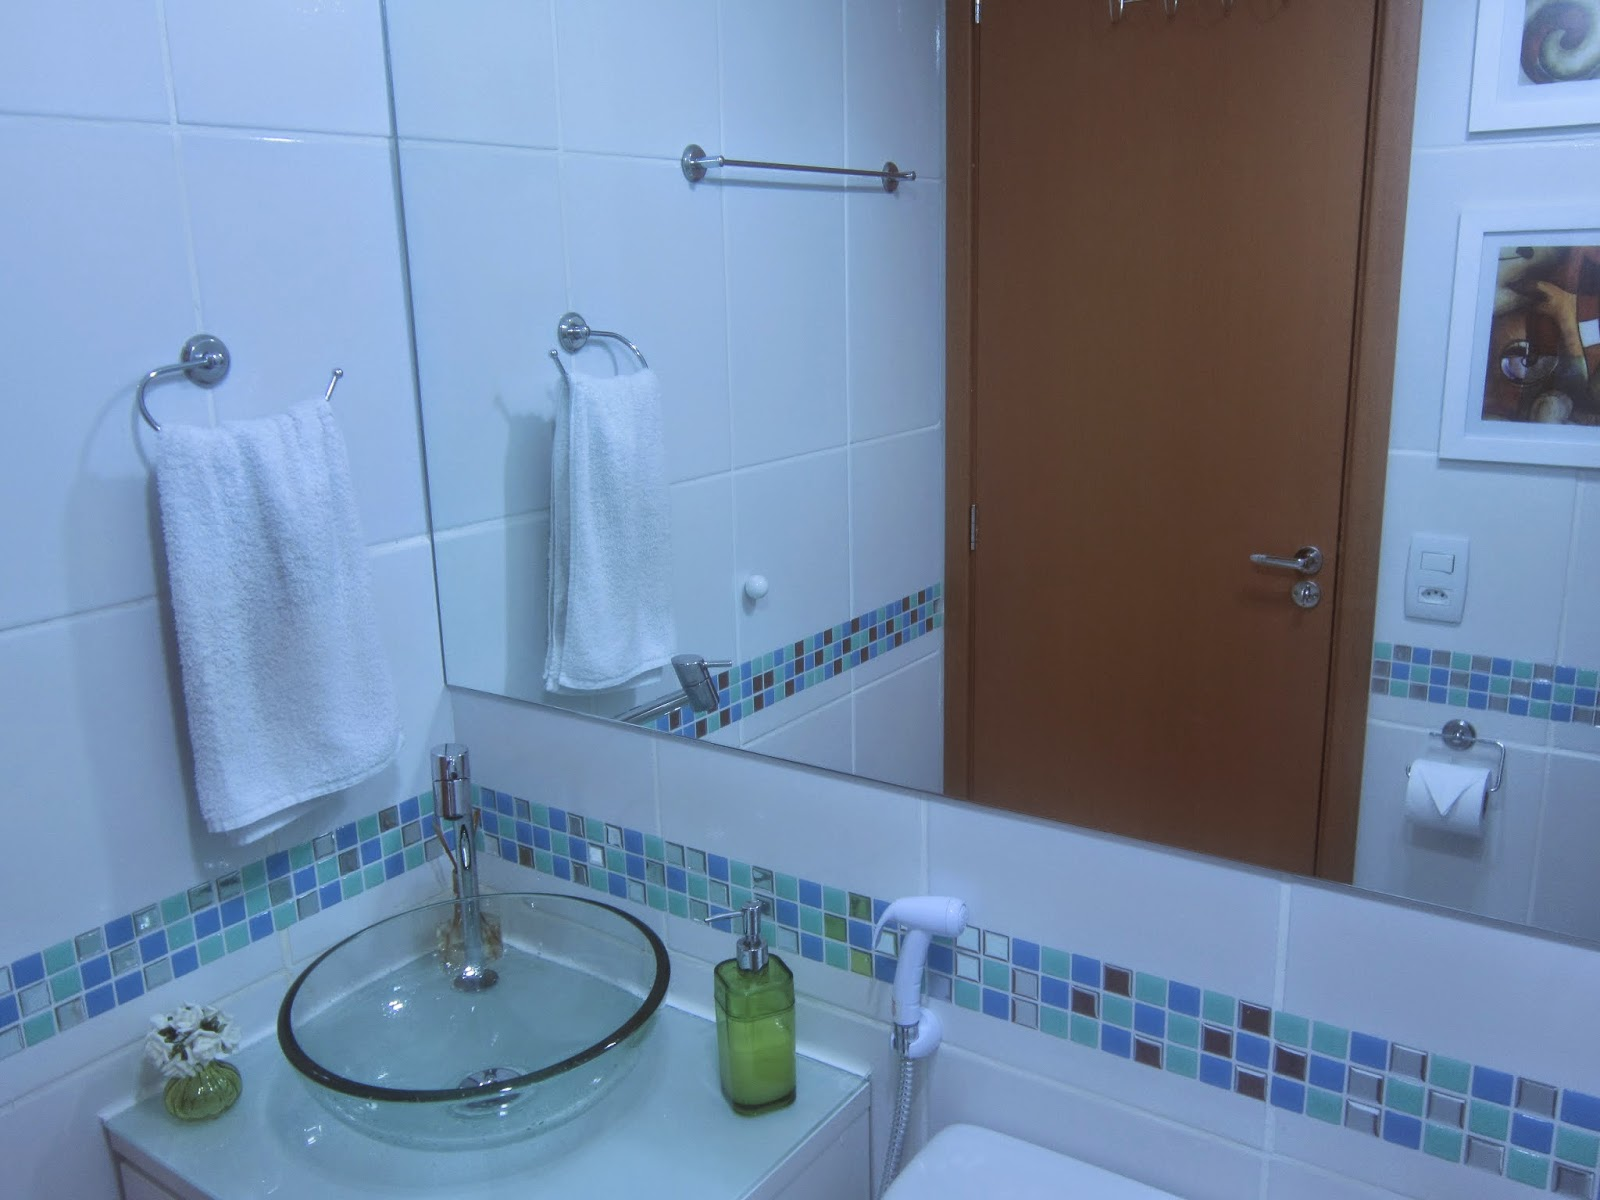 Banheiro Pequenos E Bonito, Banheiro Pequenos Simples, Banheiro Pia Bancada -> Pia Banheiro Bacia